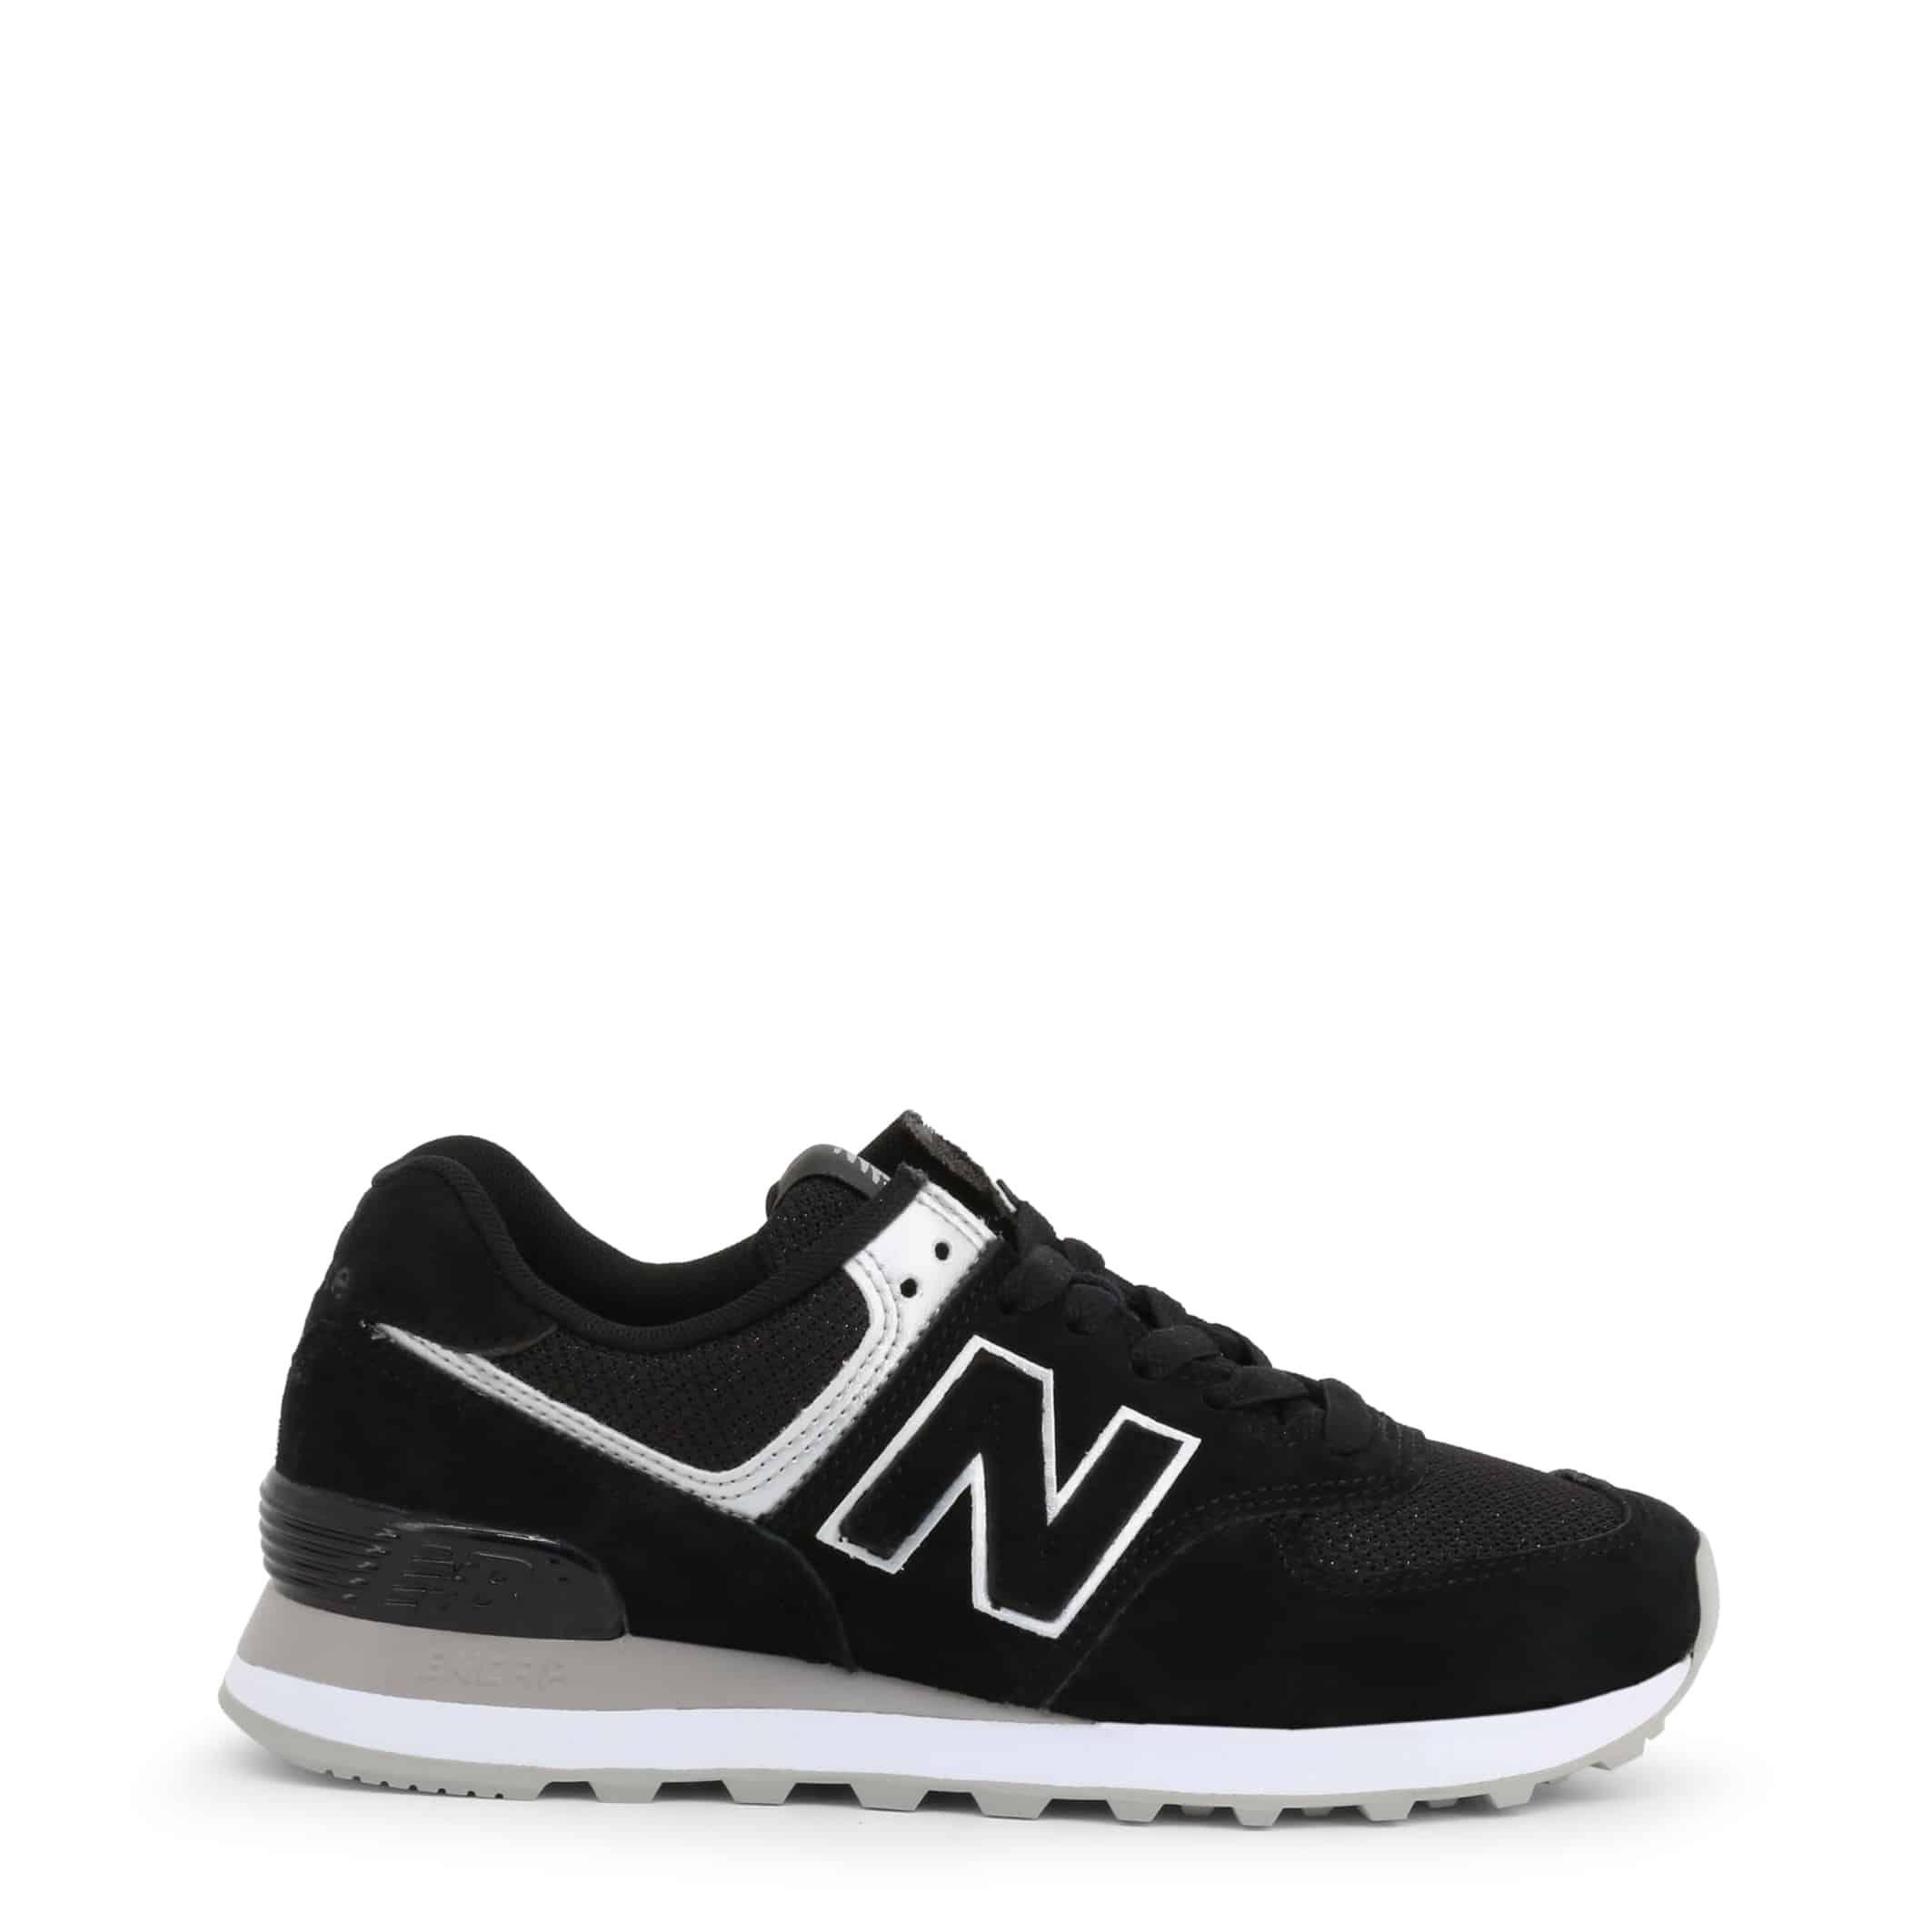 New Balance Damen Sneaker - WL574 - Schwarz